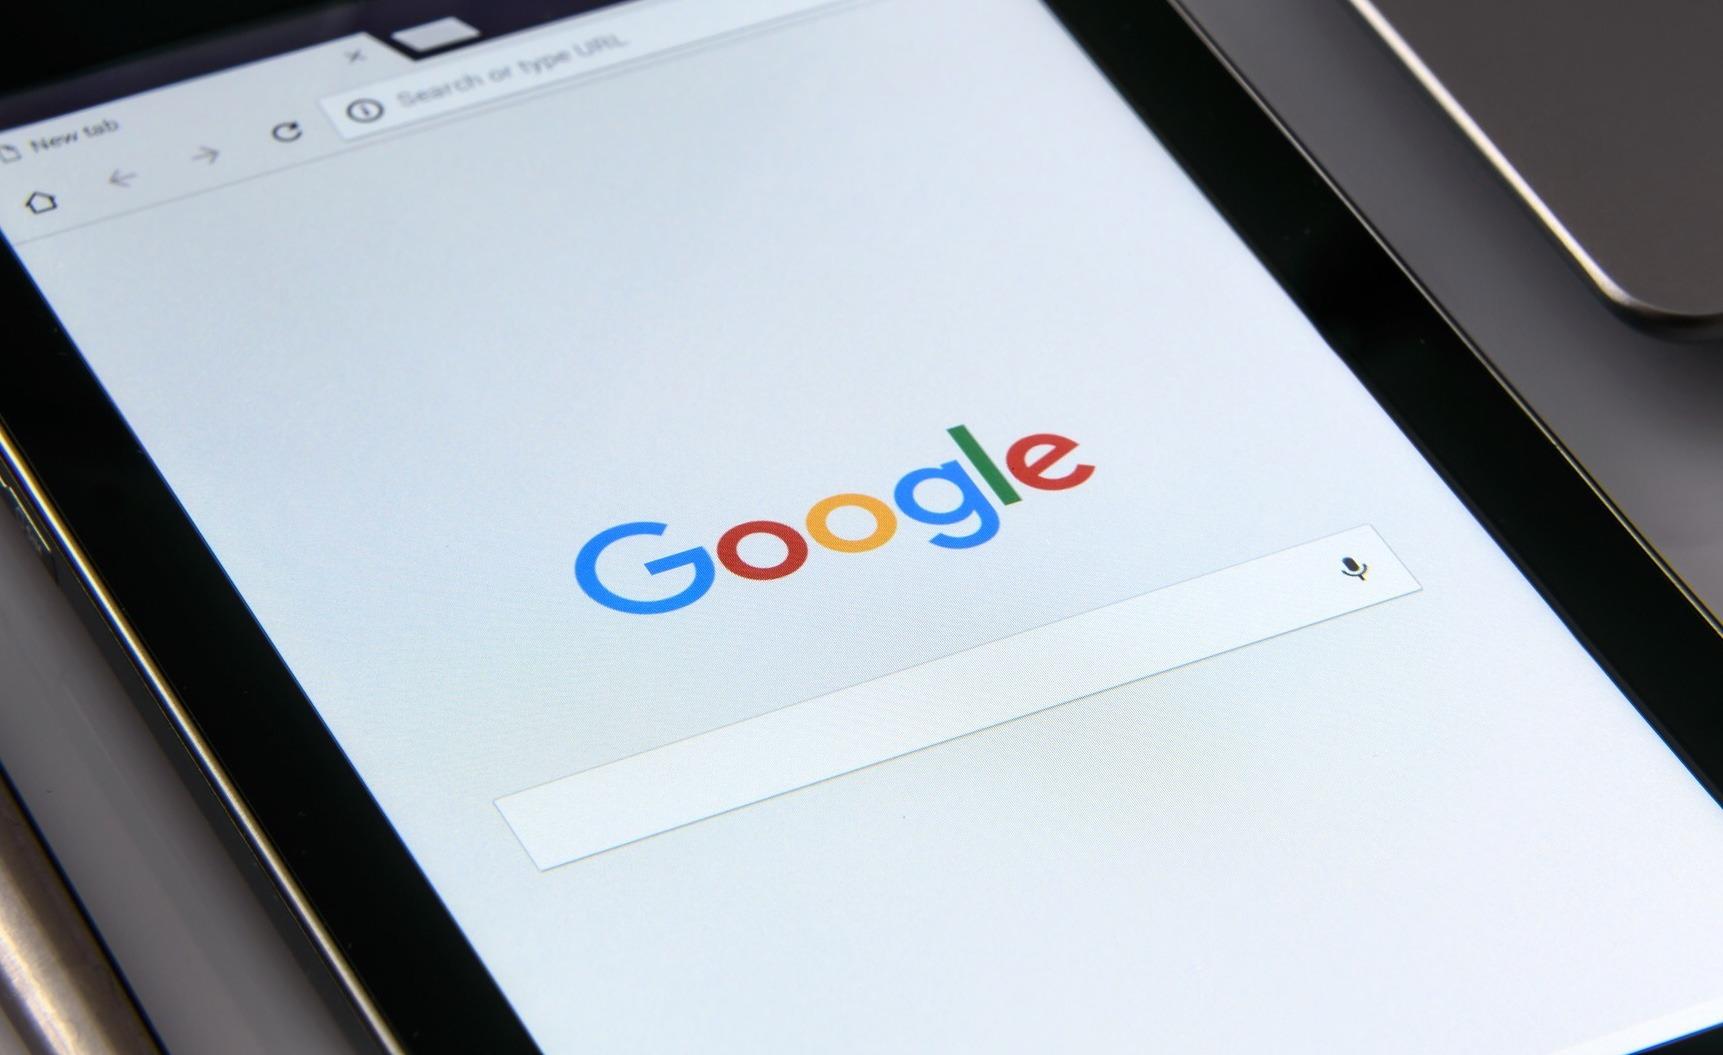 Google pagespeed Speed website